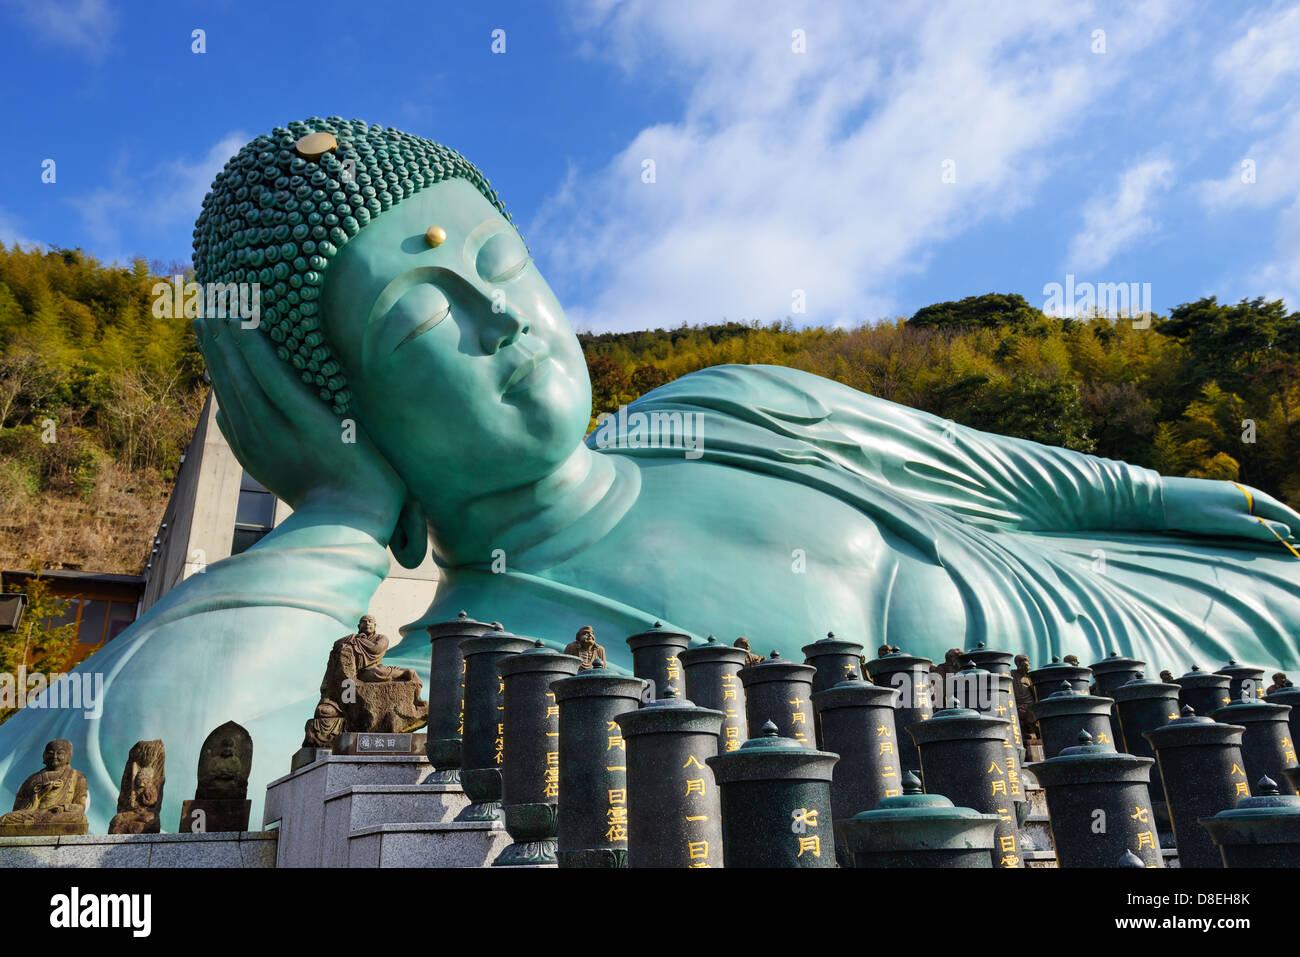 Liegender Buddha-Statue des Nanzoin-Tempels in Kyushu, Japan. Stockbild